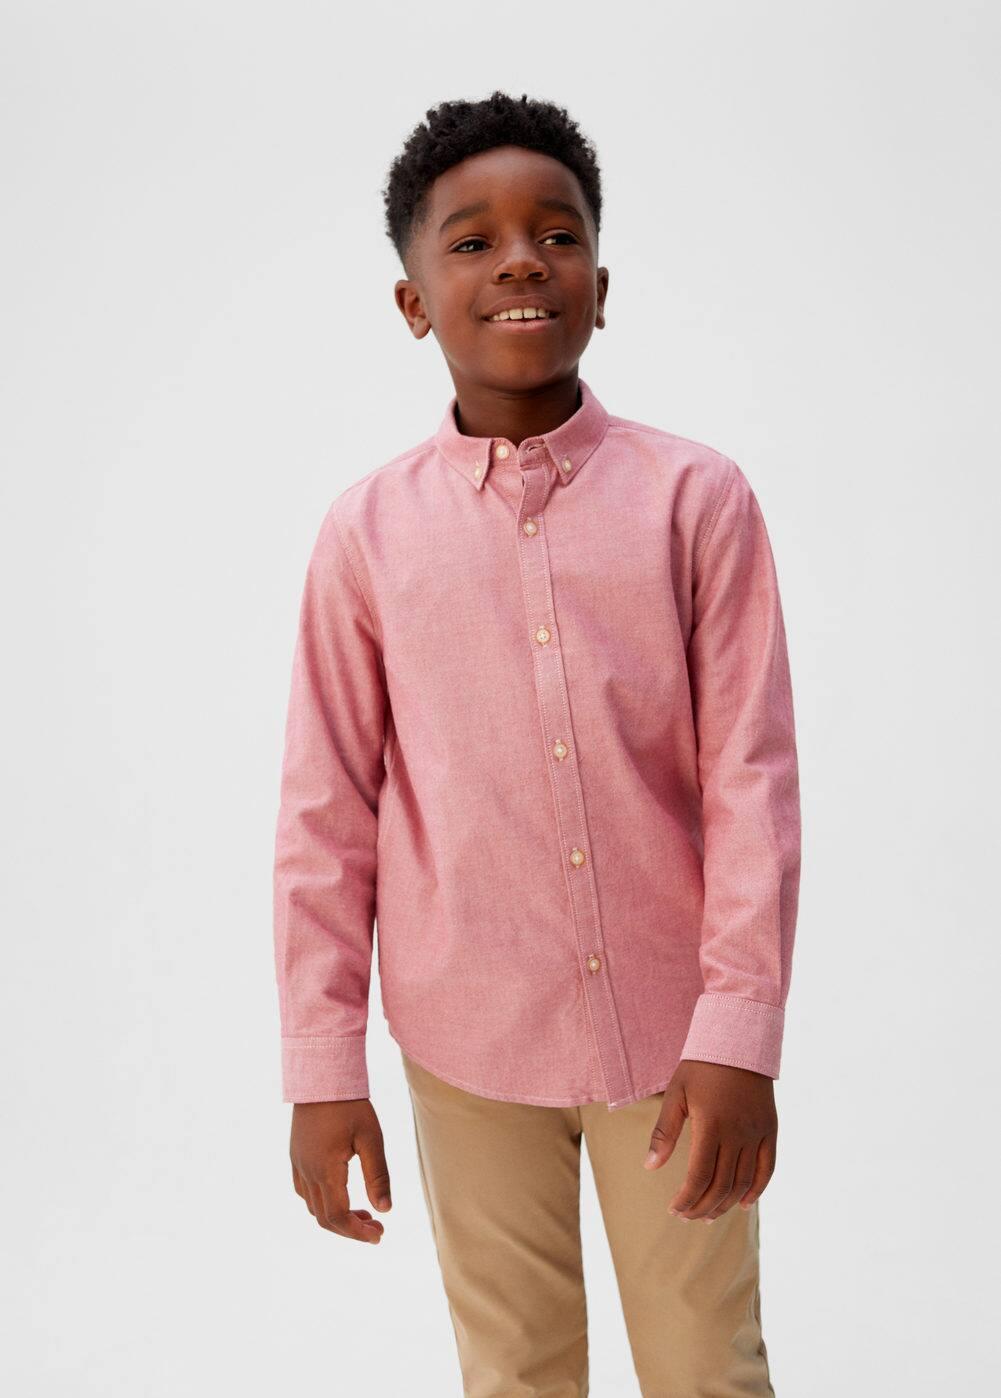 o-oxford5:pack de 2 camisas oxford algodon